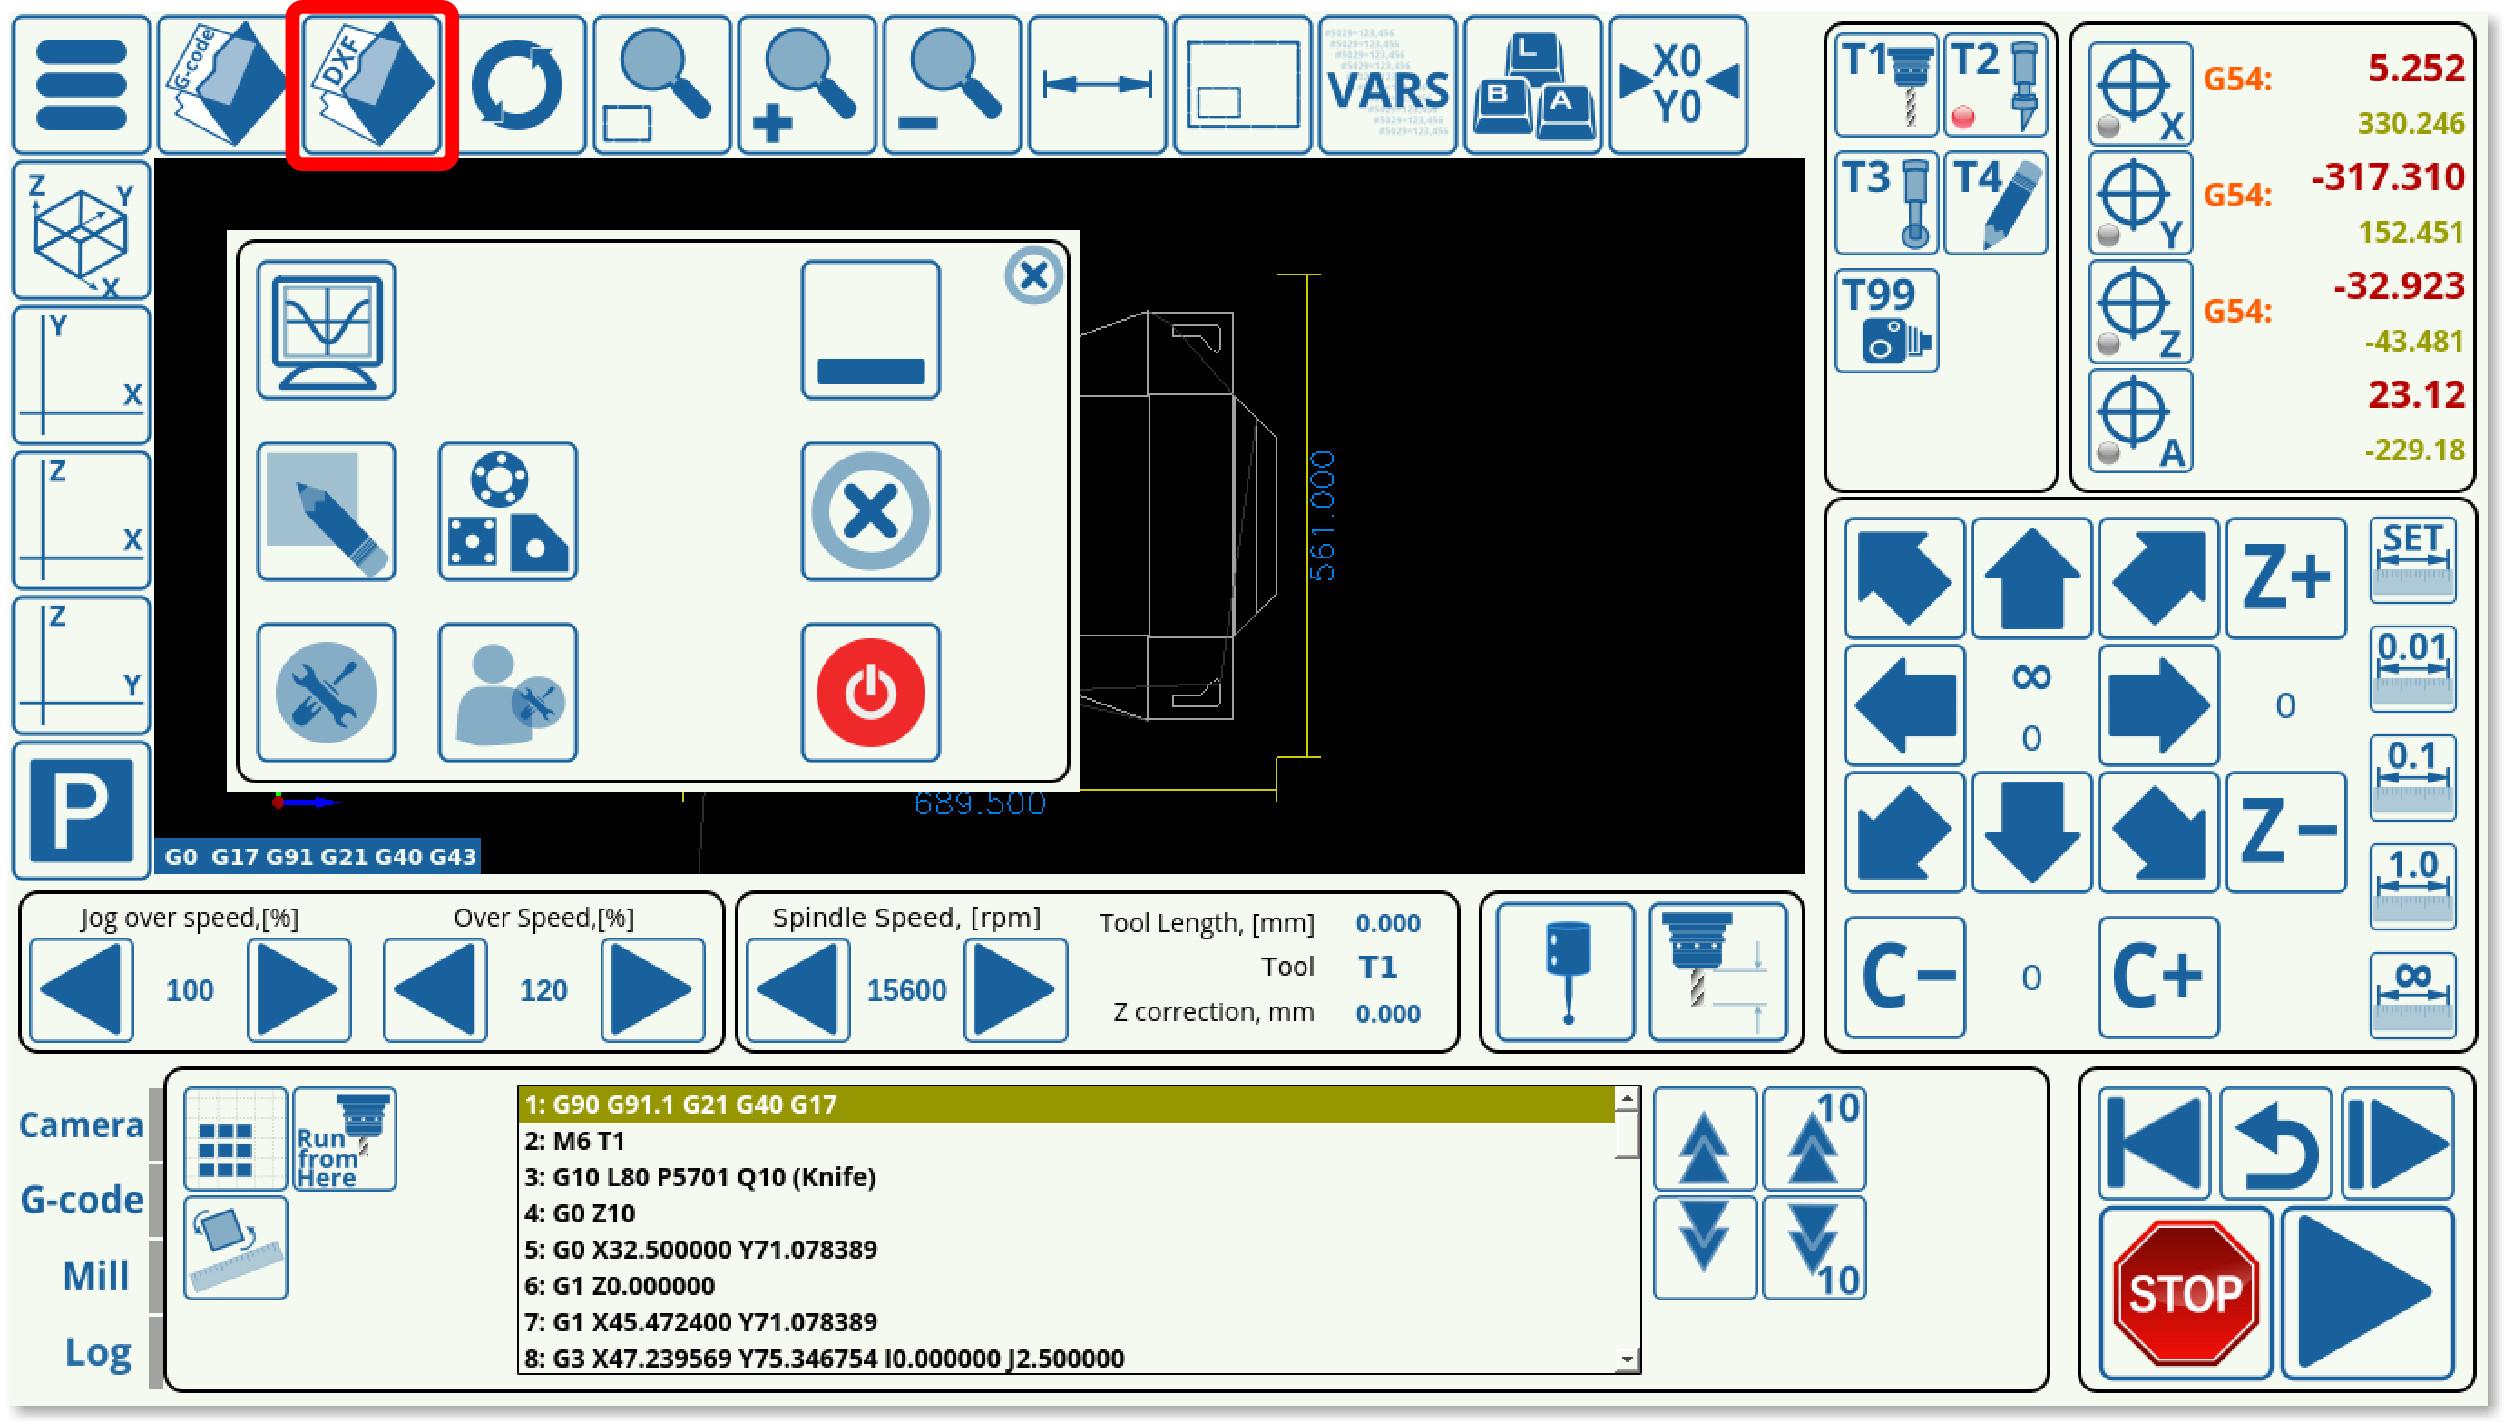 camera-j17-open-dxf-001.jpg